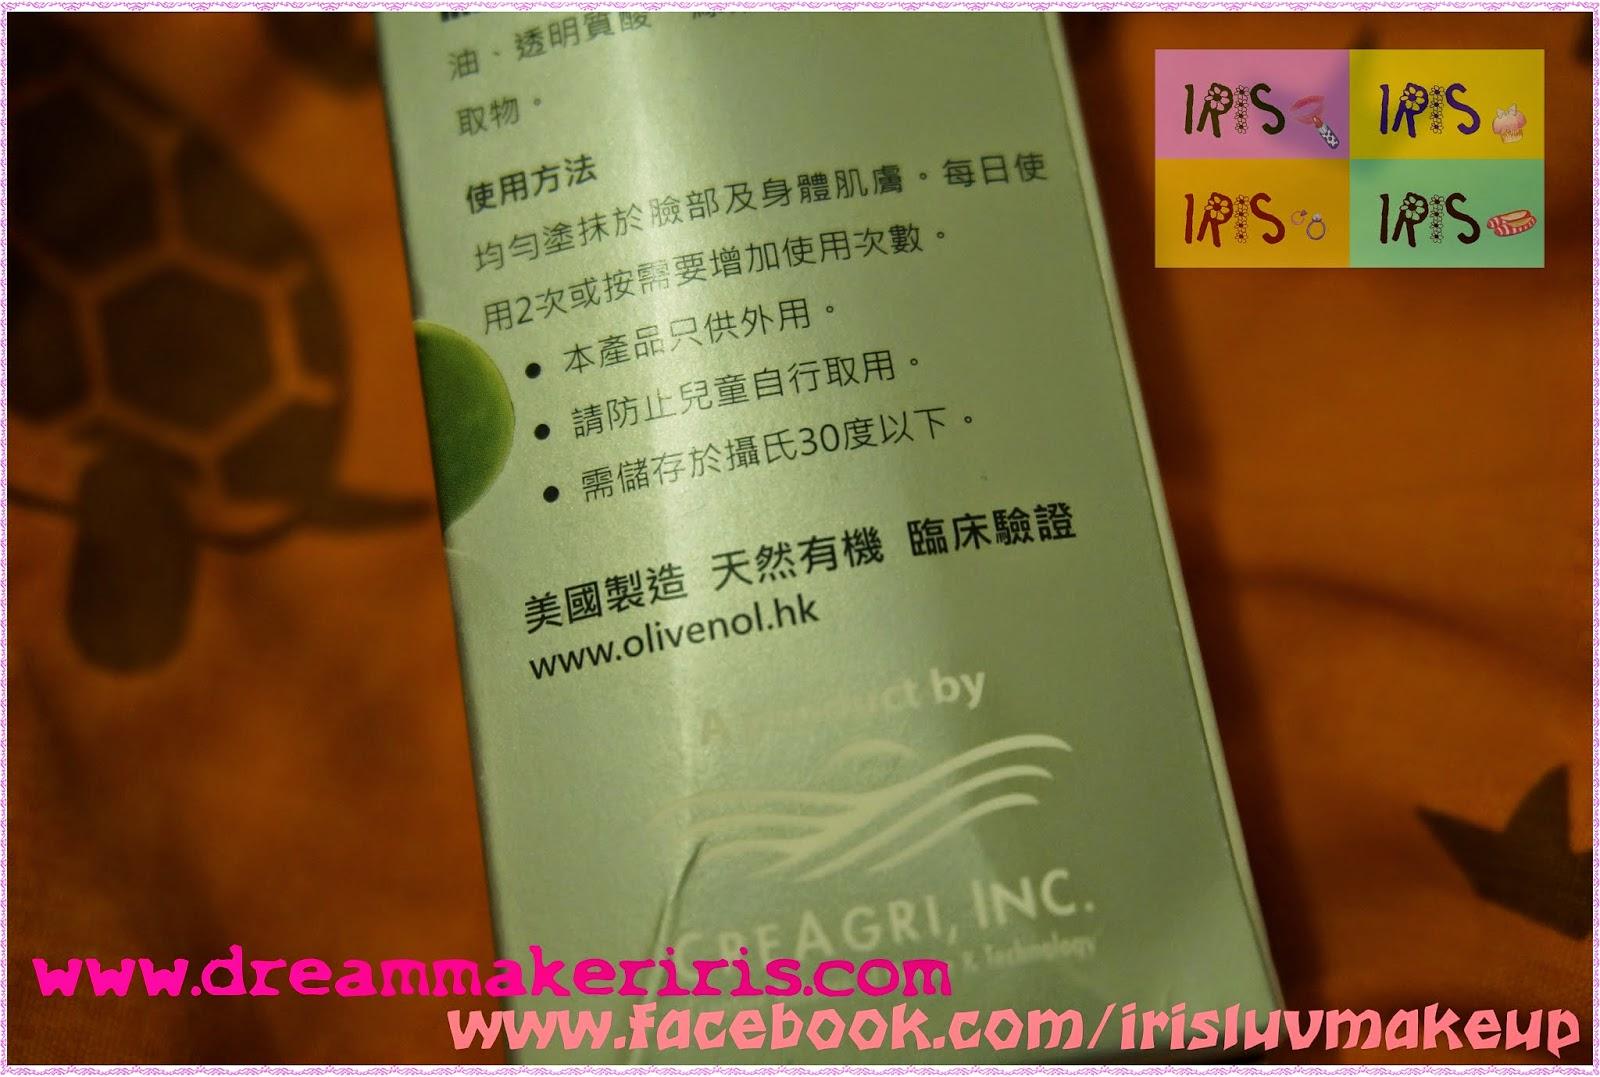 http://4.bp.blogspot.com/-uLTAQIsbKyE/VA82gaho6LI/AAAAAAAAX3c/bXm1ldH6C54/s1600/DSC09333.JPG